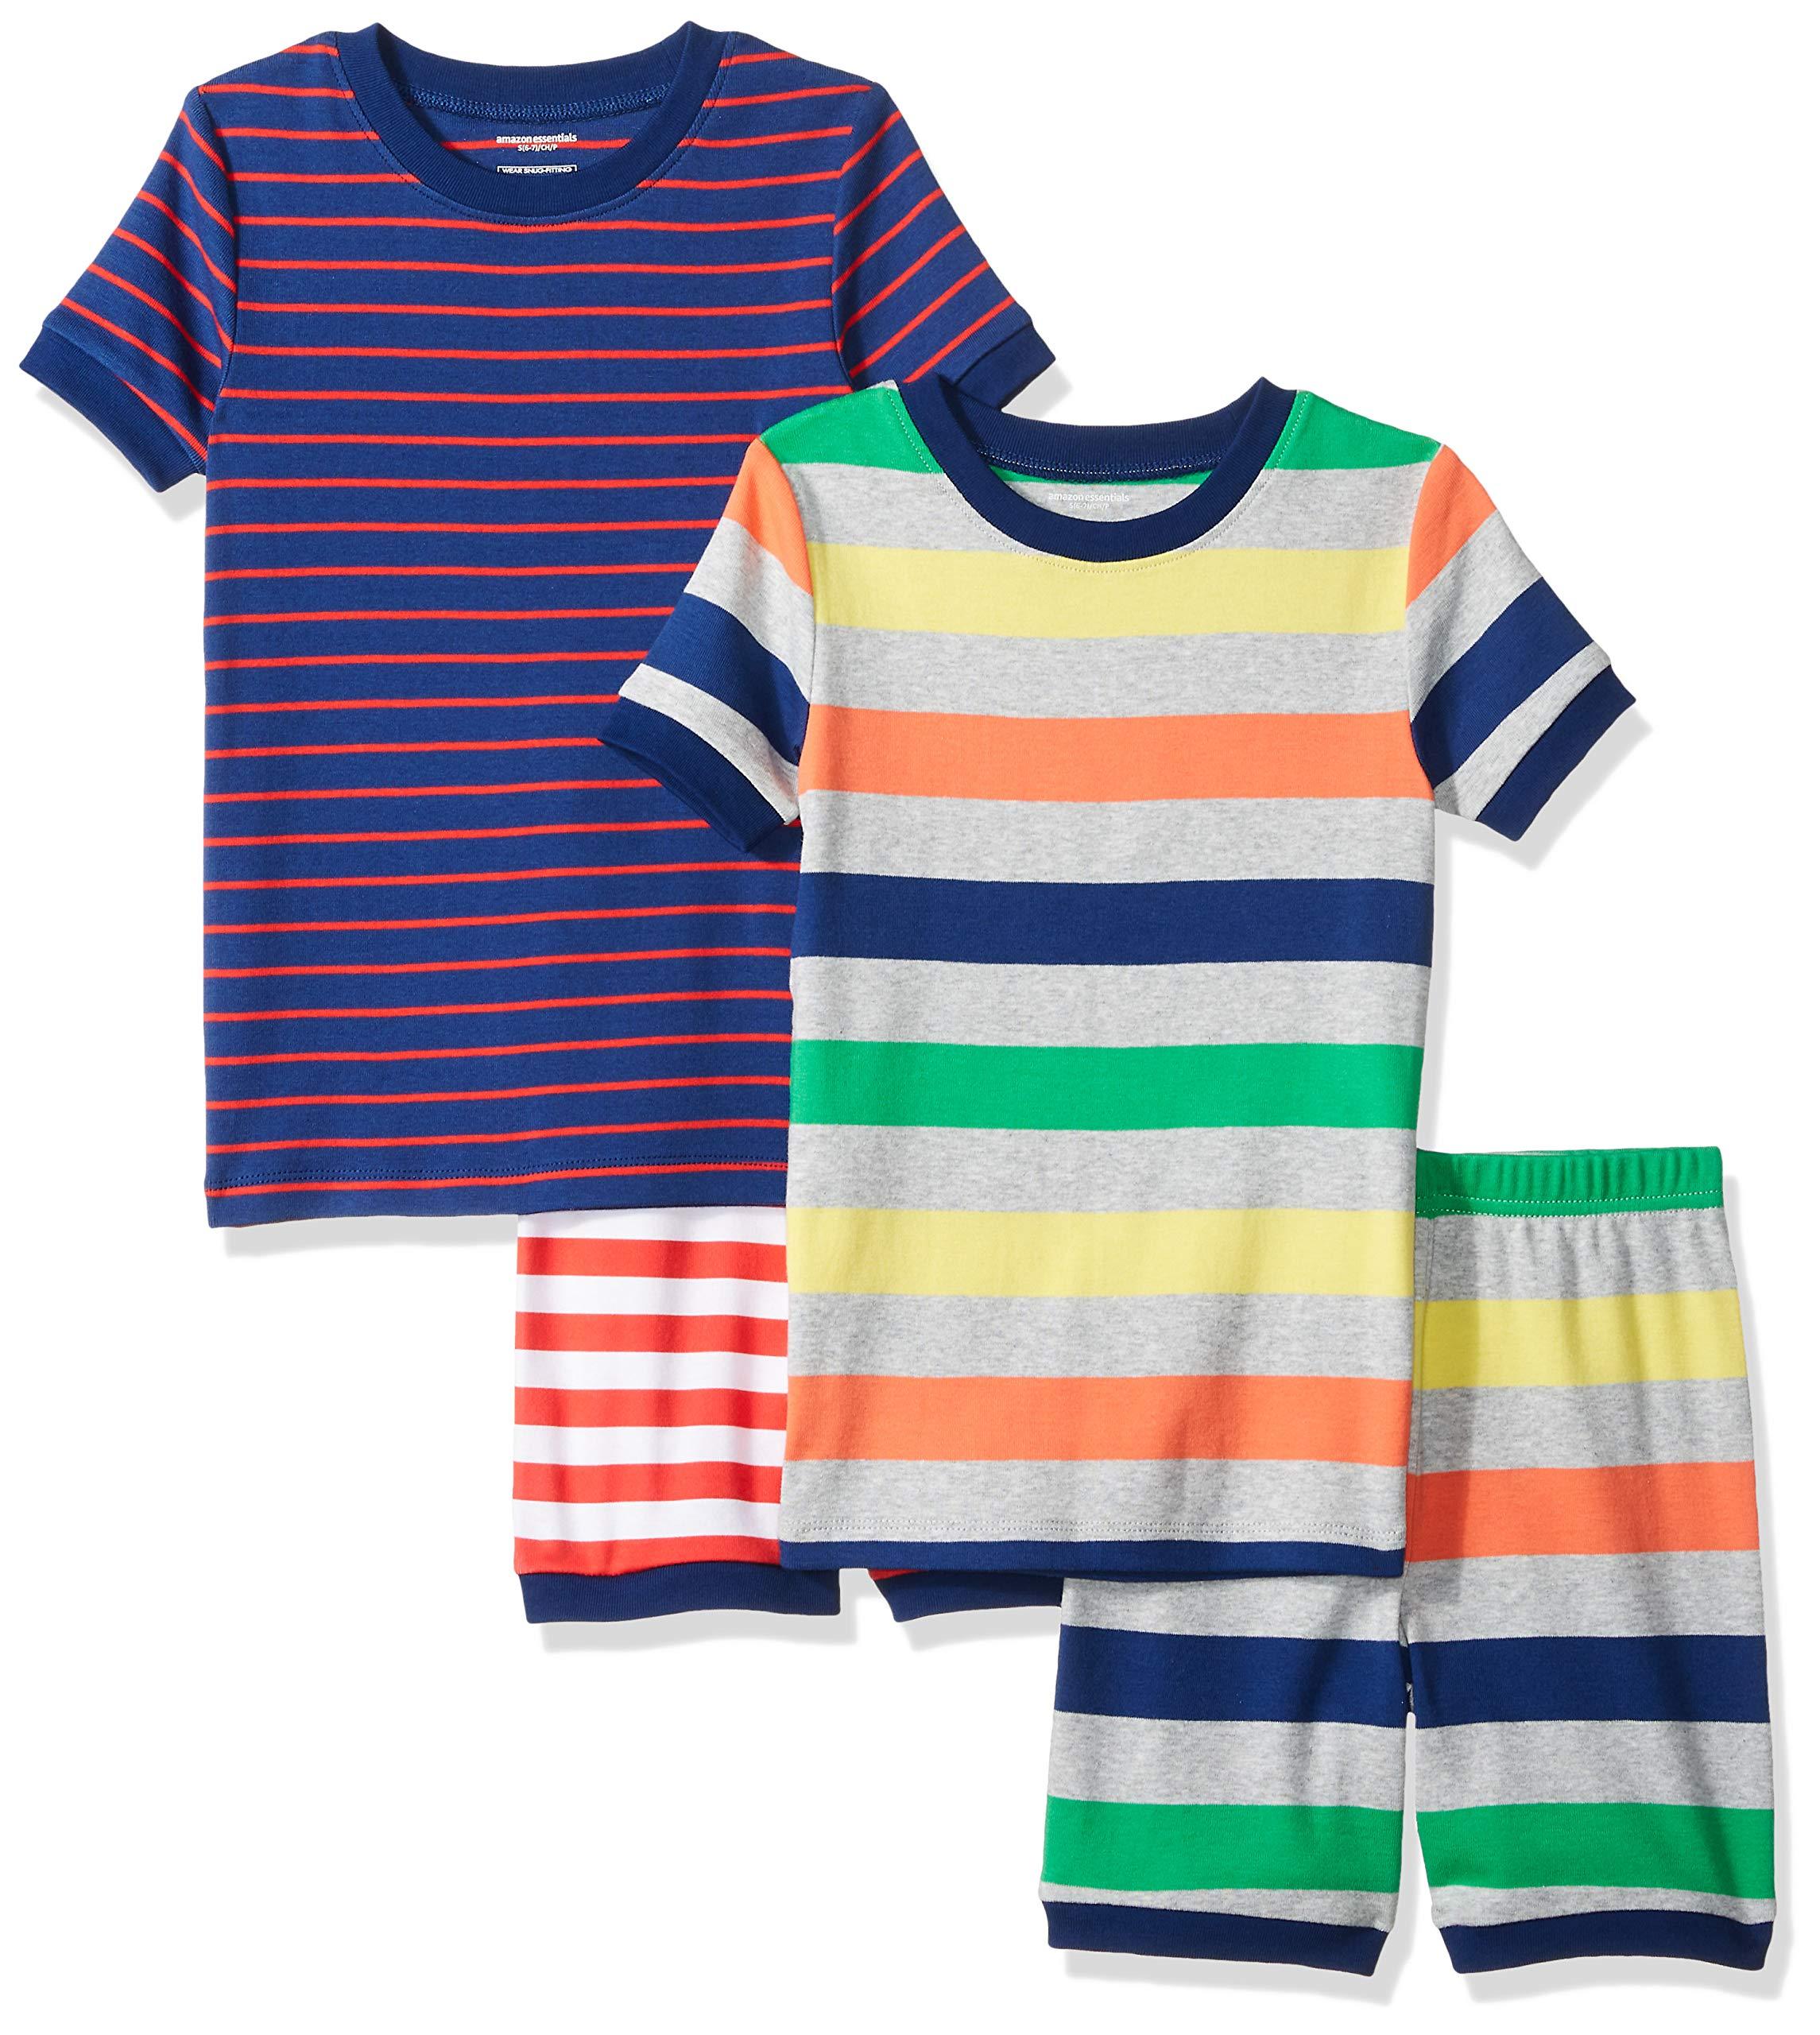 Amazon Essentials Little Boys' 4-Piece Sleeve Short Pajama Set, Multistripes, S (6-7)